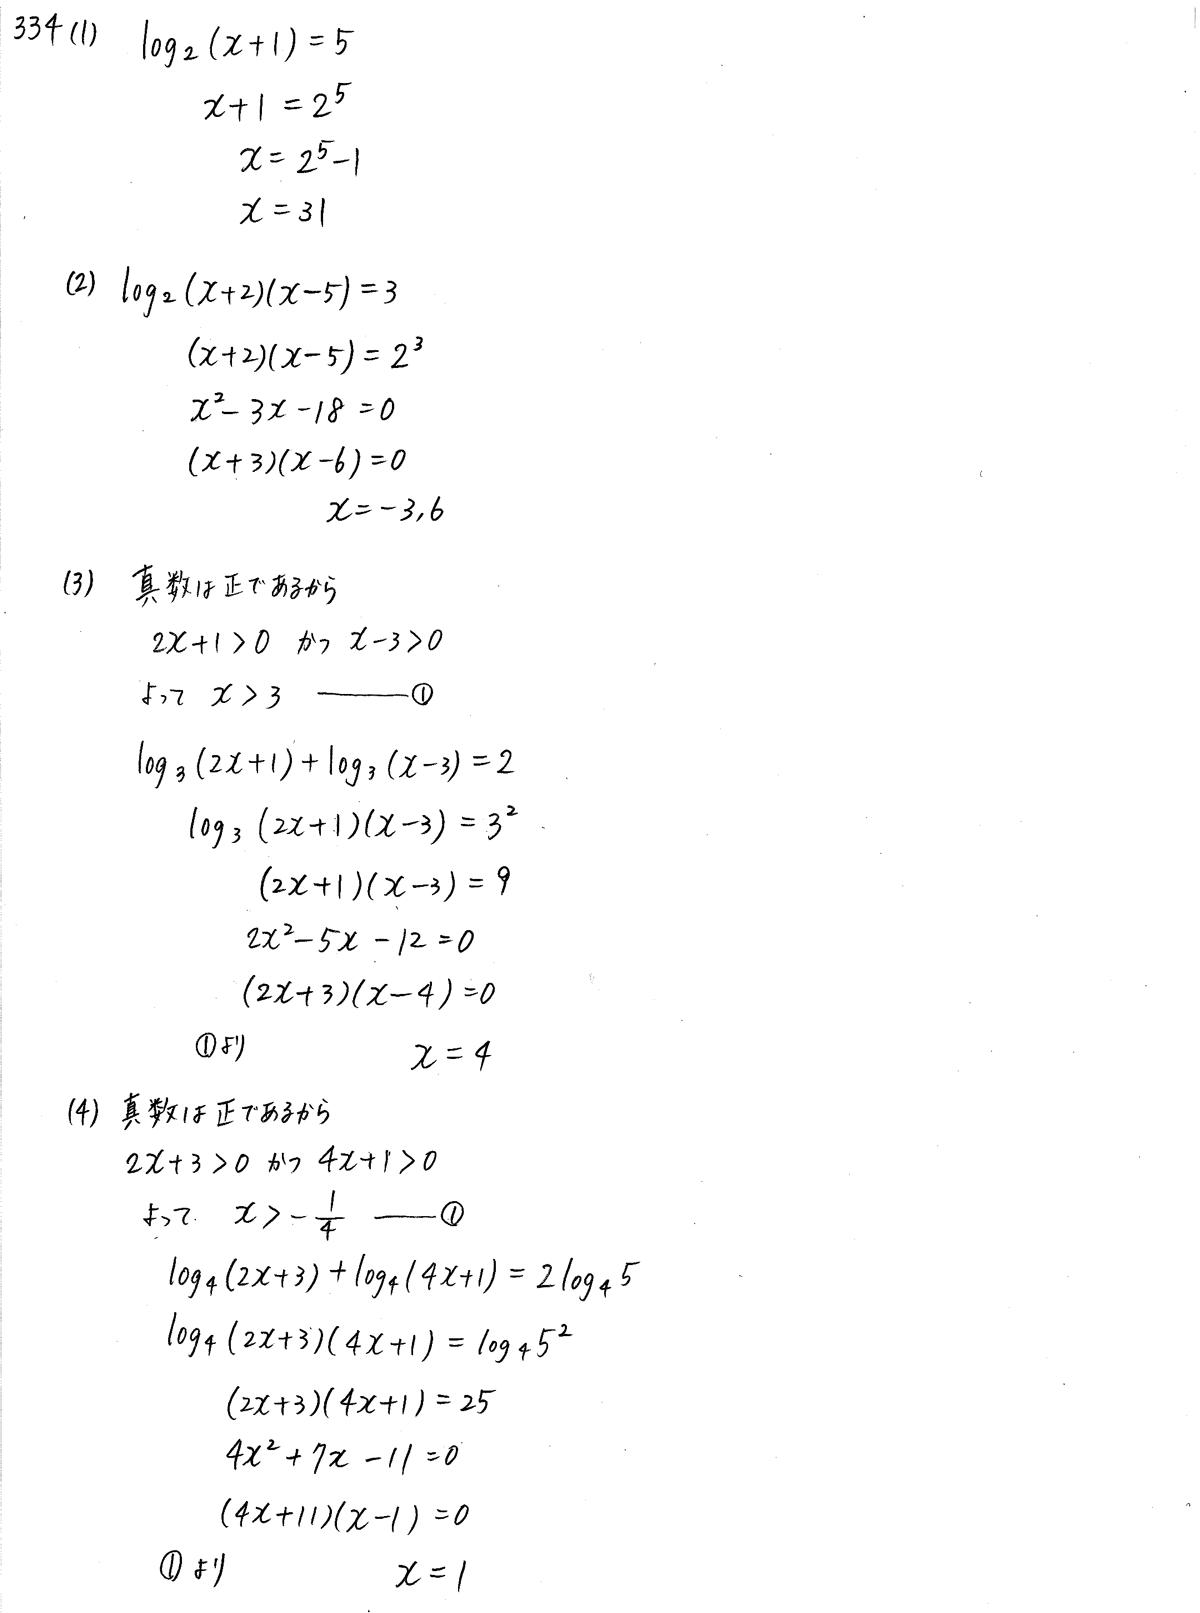 3TRIAL数学2-334解答